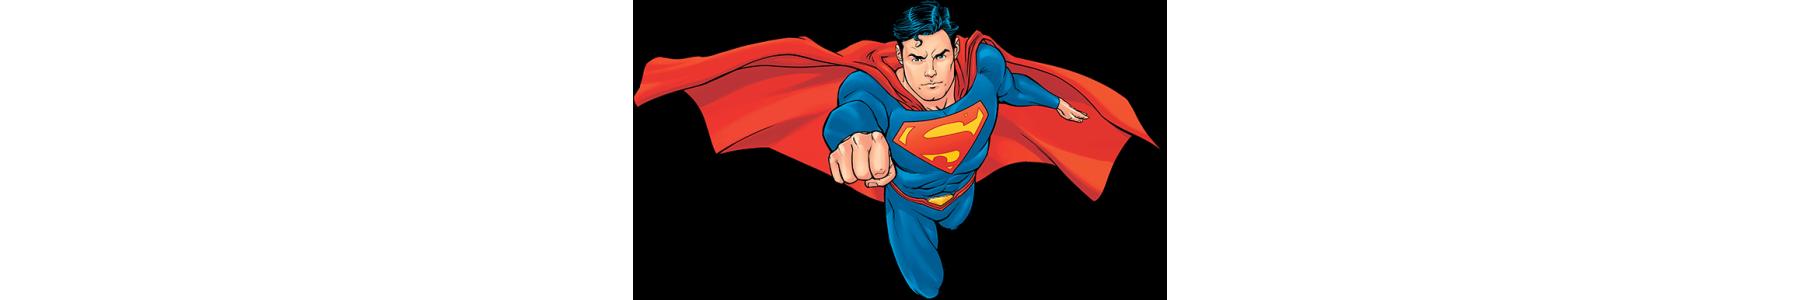 Articole de petrecere Superman Comics